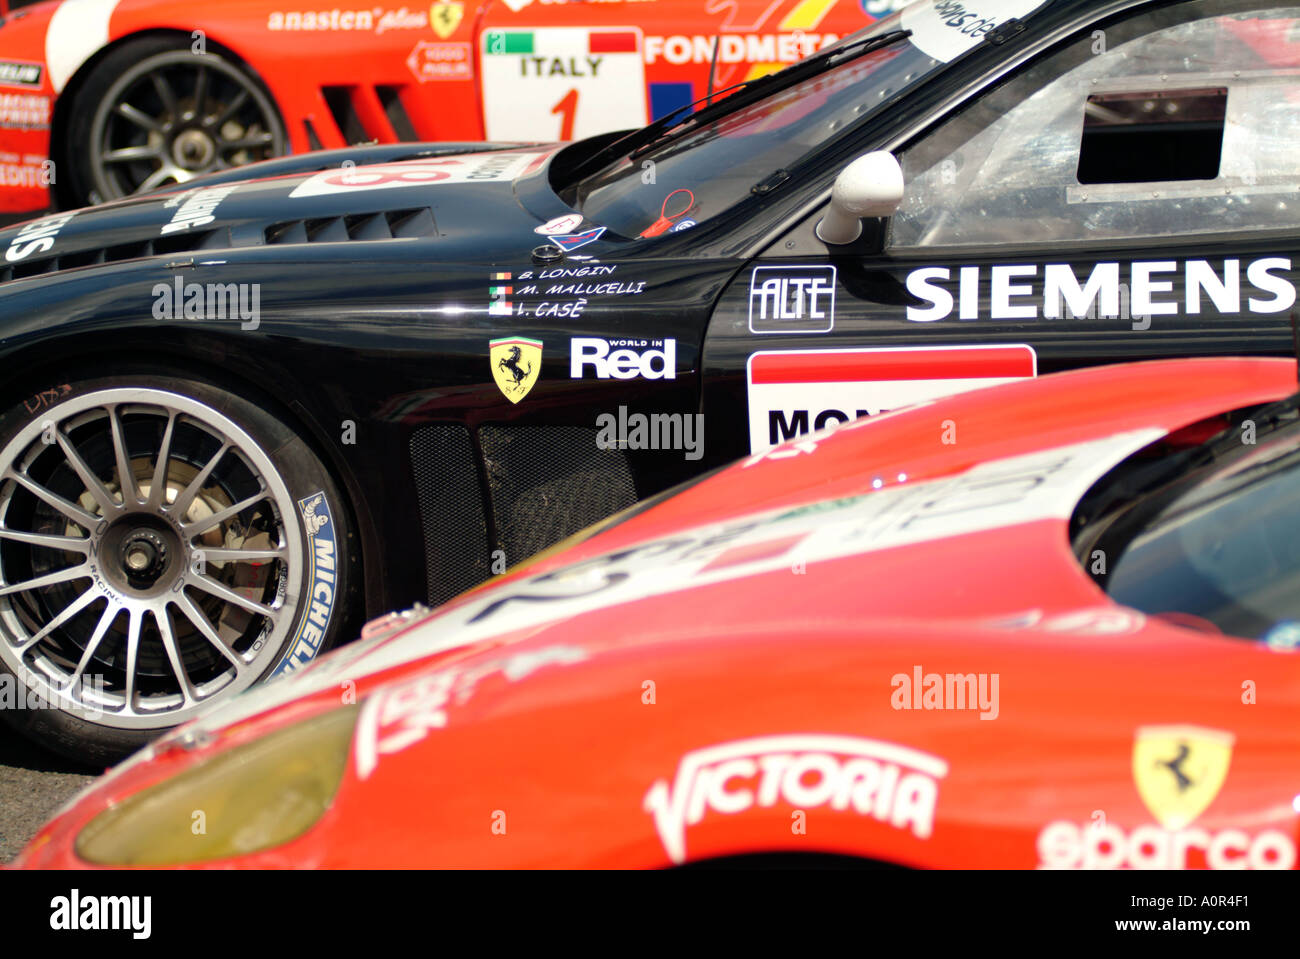 ferrari sponsor advertising wheel tyre slick racing car race motor sport auto risk win lose fast speed power prancing - Stock Image